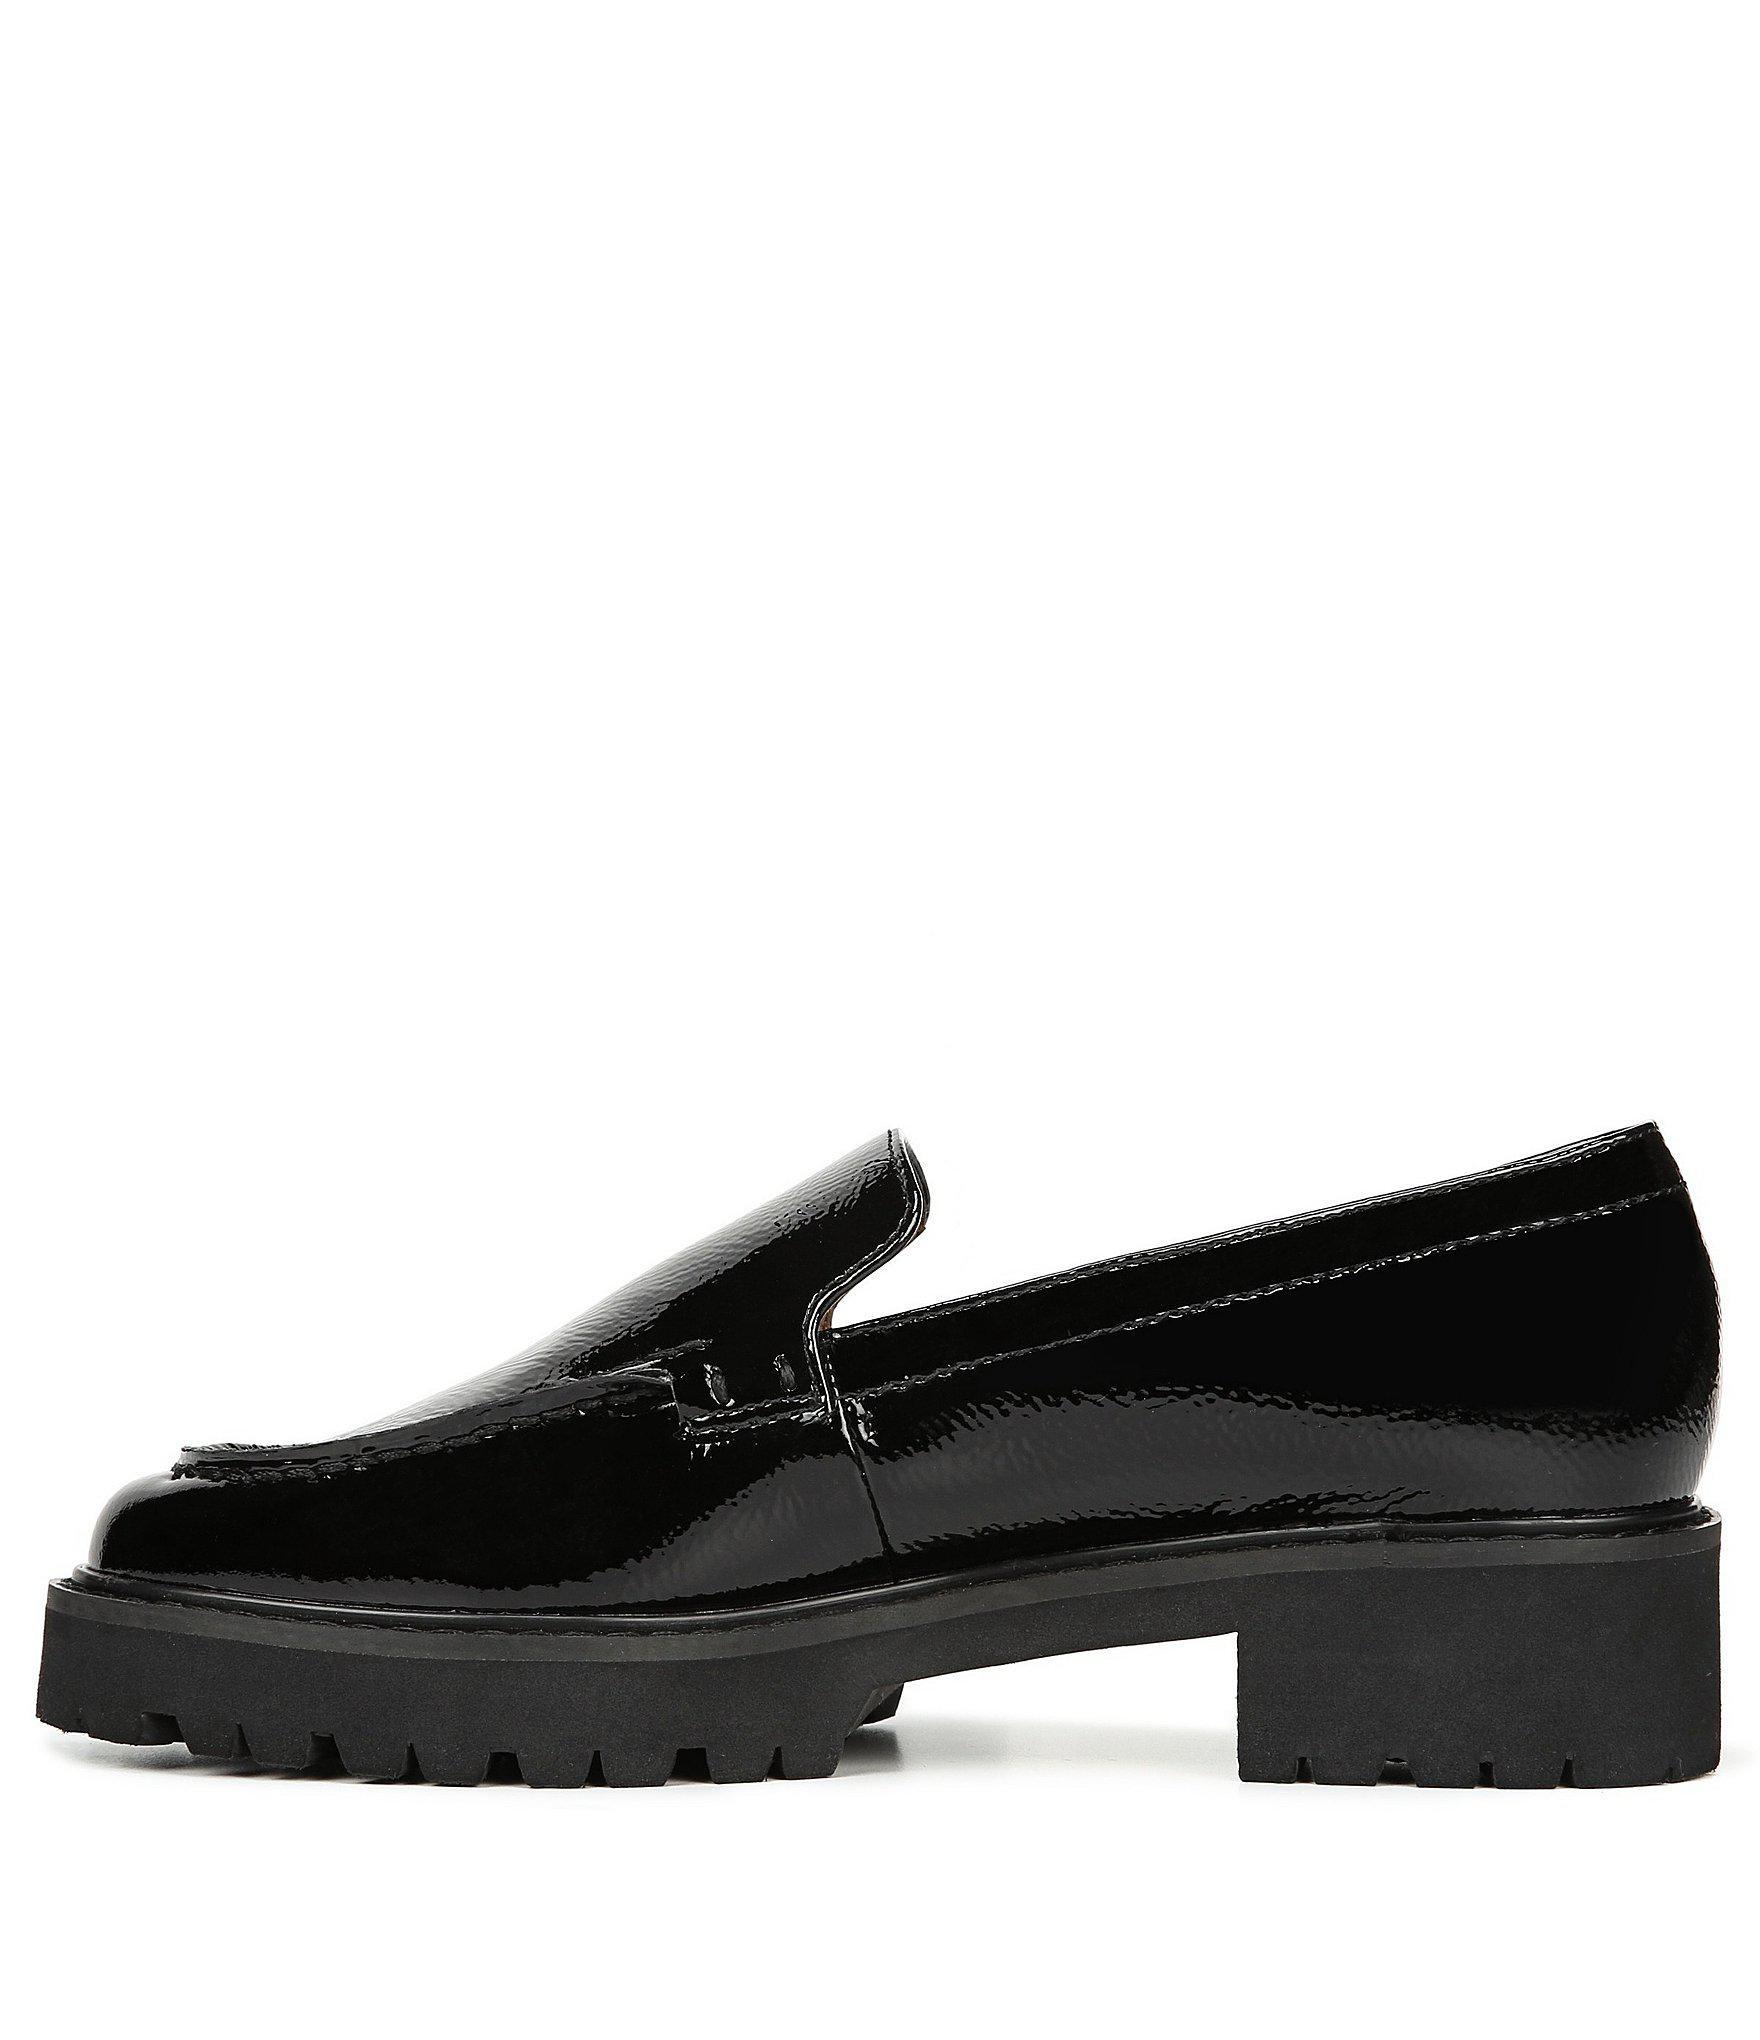 e8863b63f54 Franco Sarto - Black Sarto By Delana Patent Leather Platform Loafers - Lyst.  View fullscreen